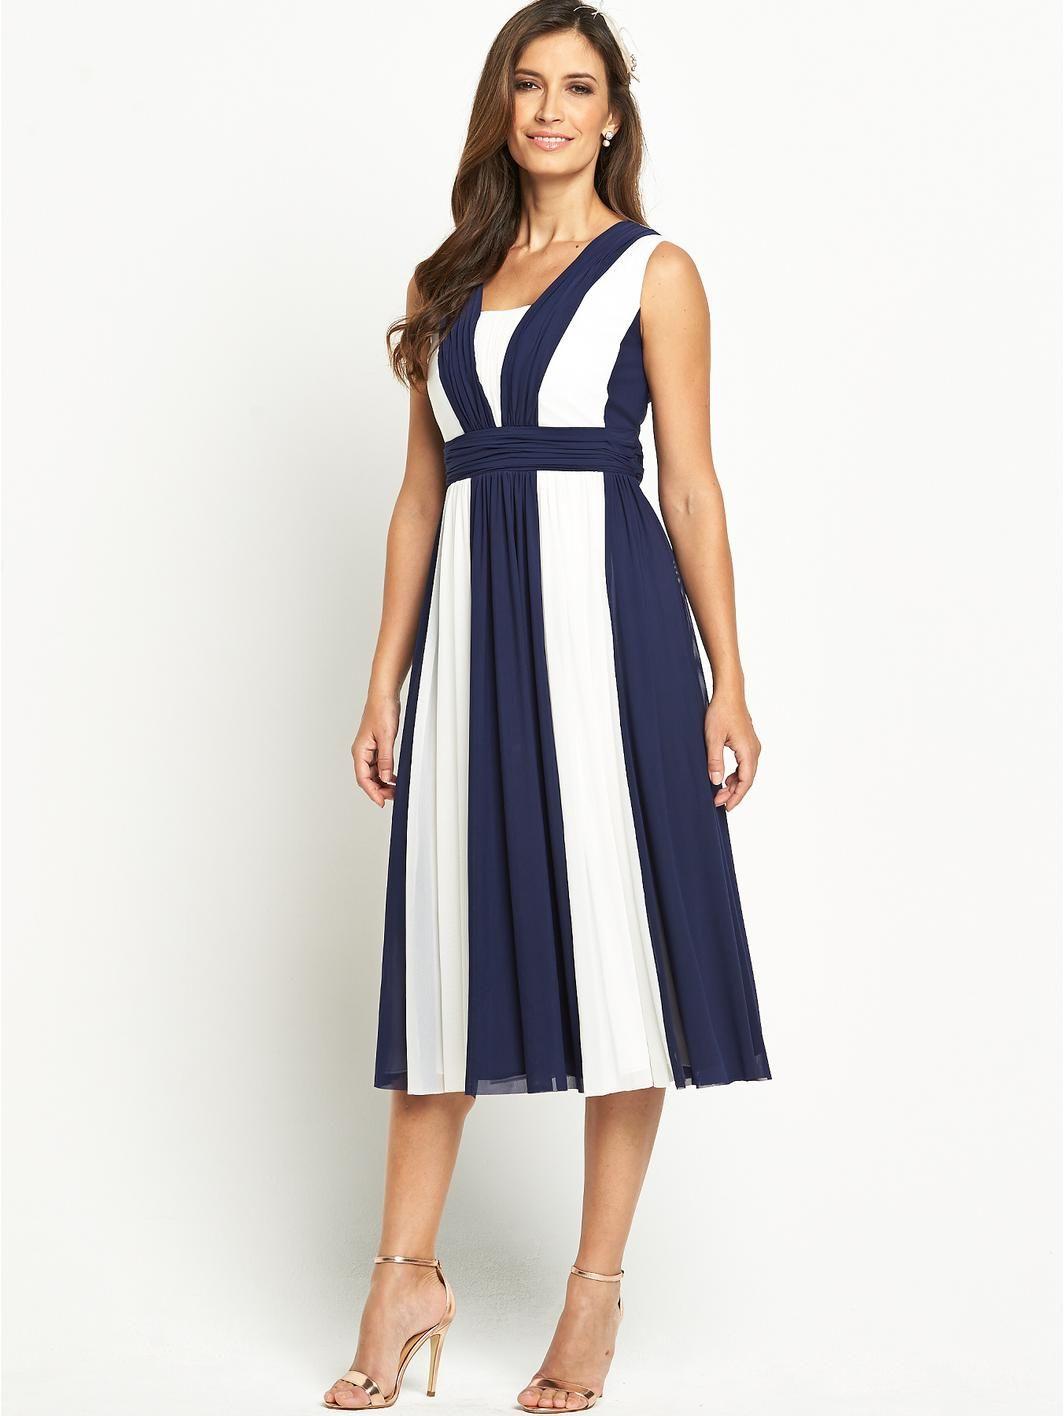 Berkertex pleated bodice maxi dress with stole